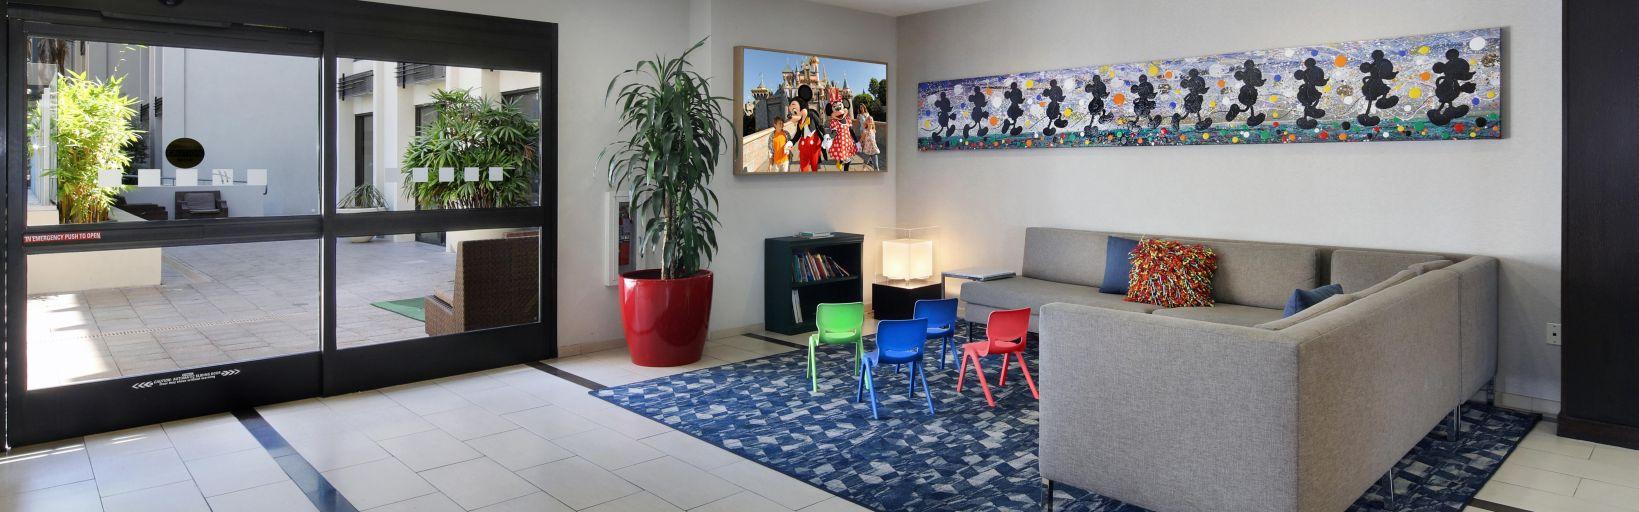 Hotel Lobby Kids Corner